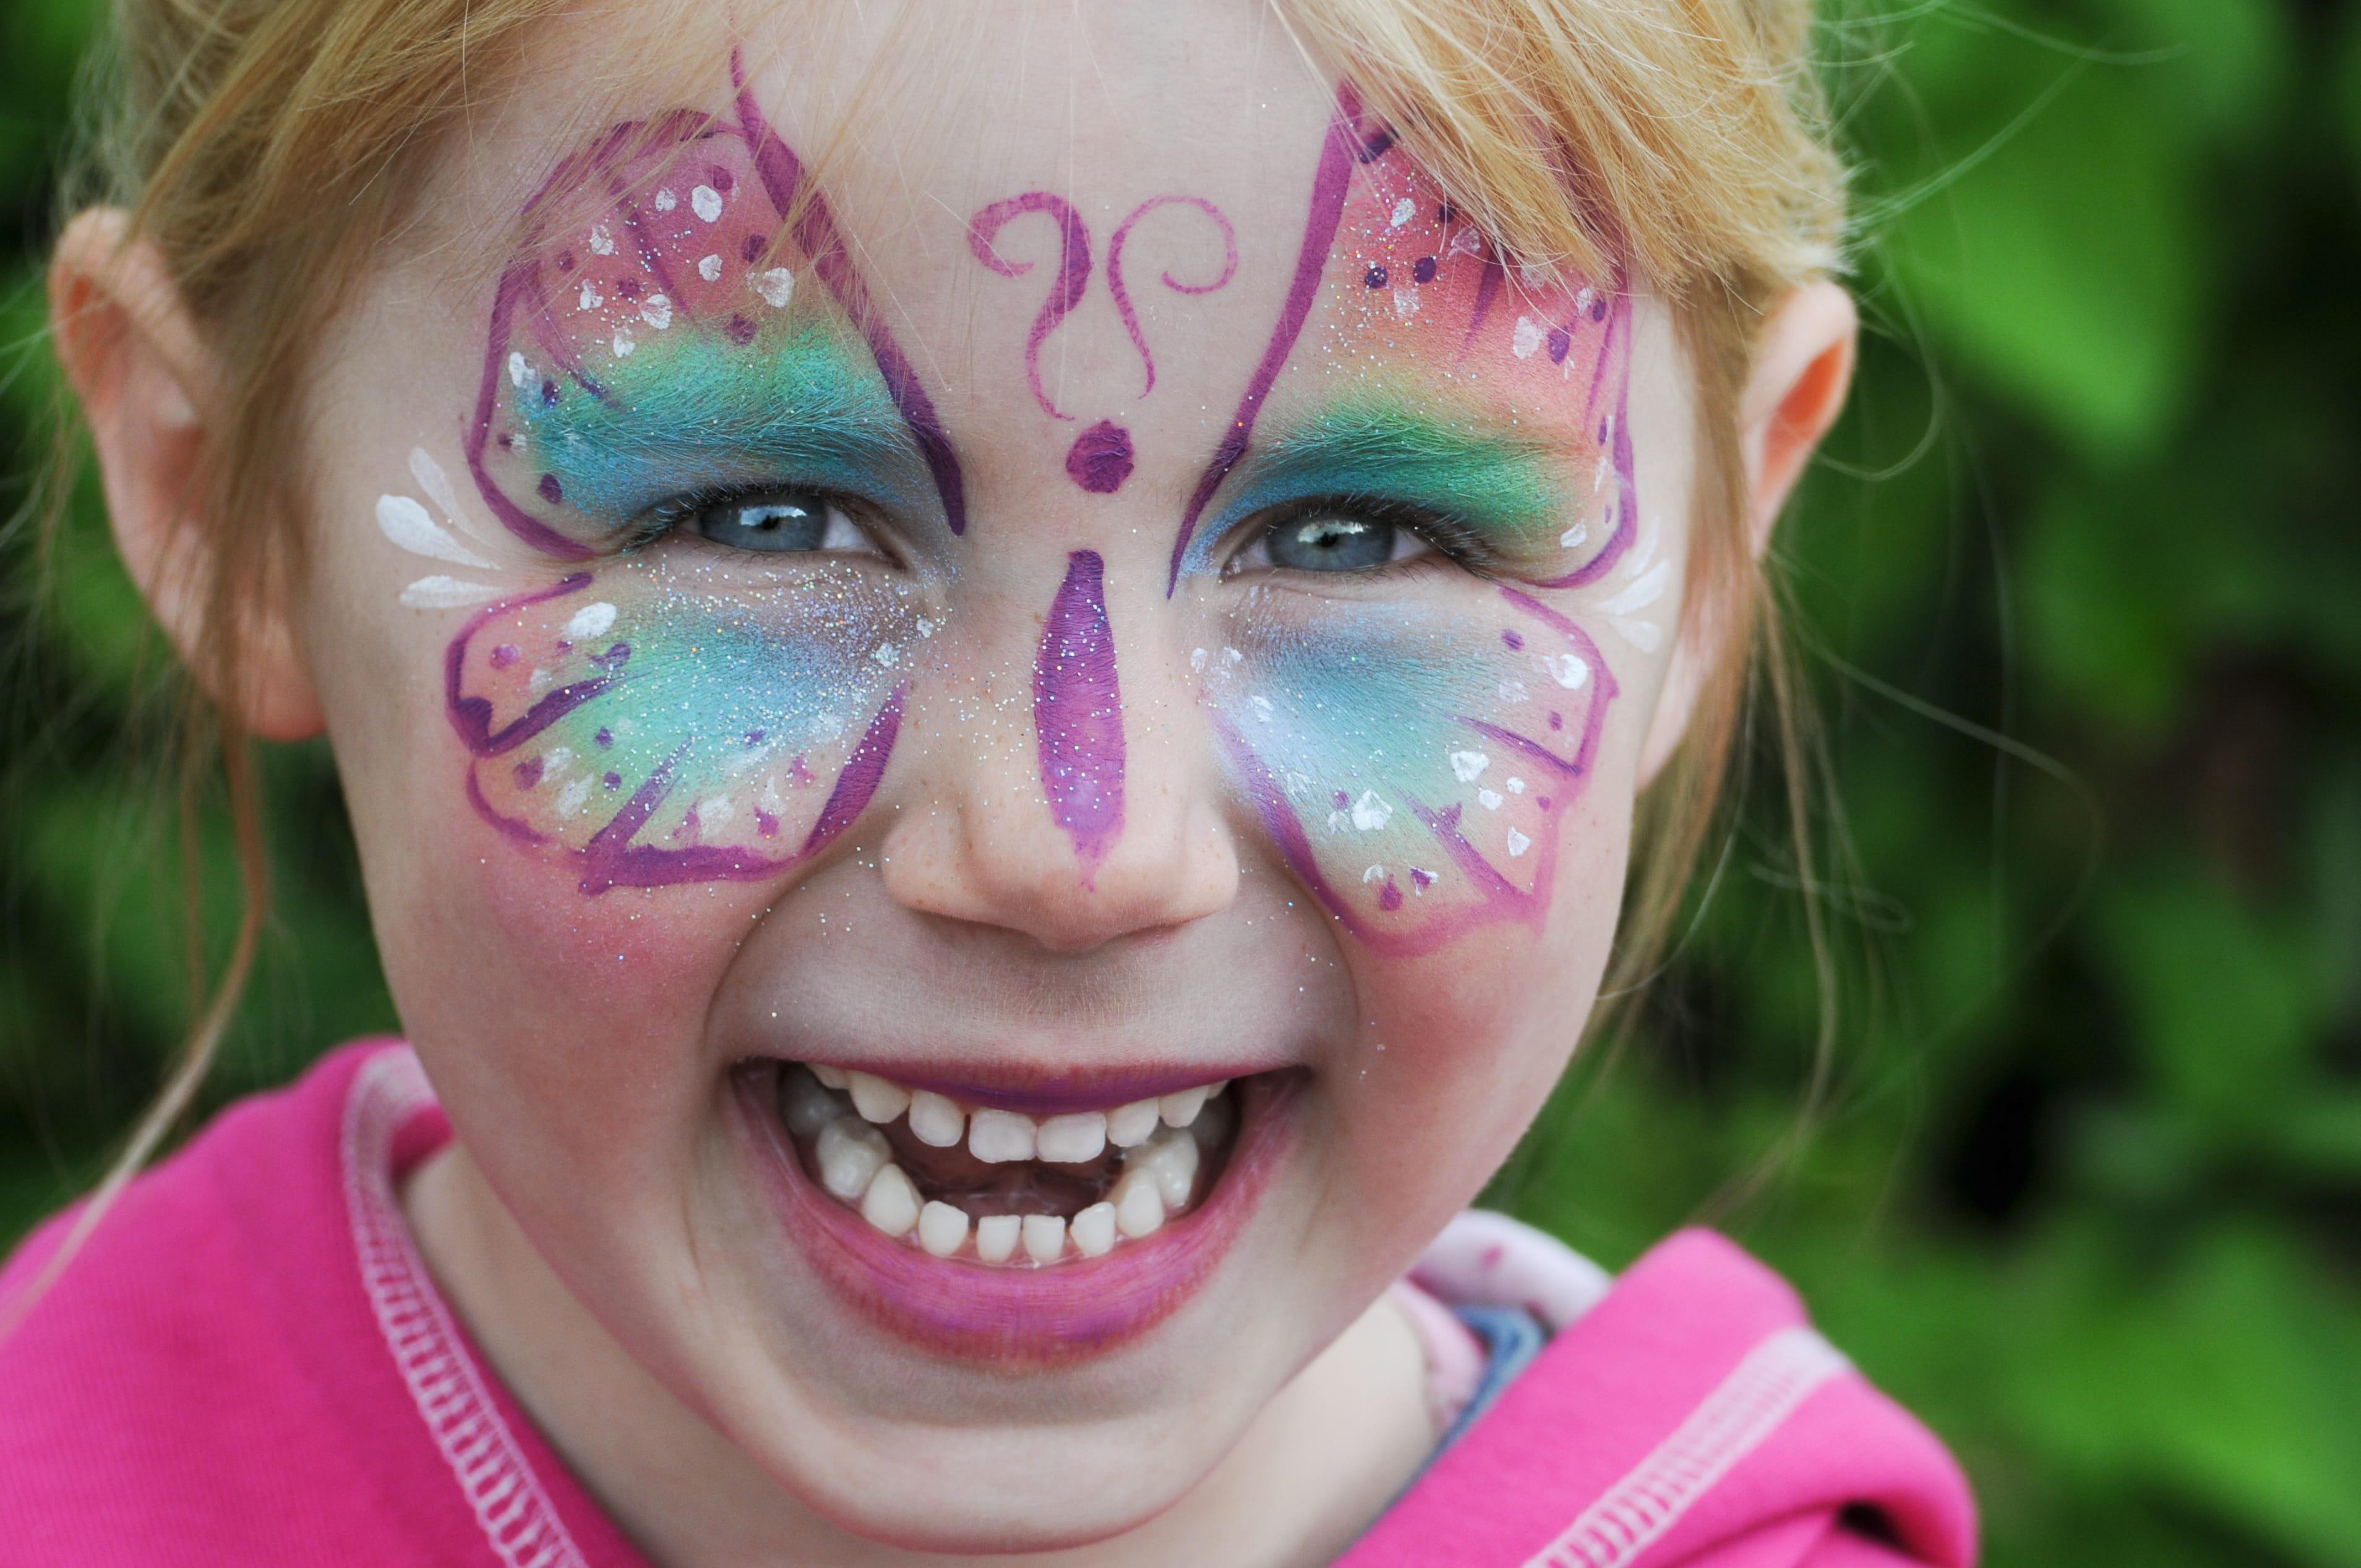 Modele maquillage princesse facile - Modele maquillage carnaval facile ...